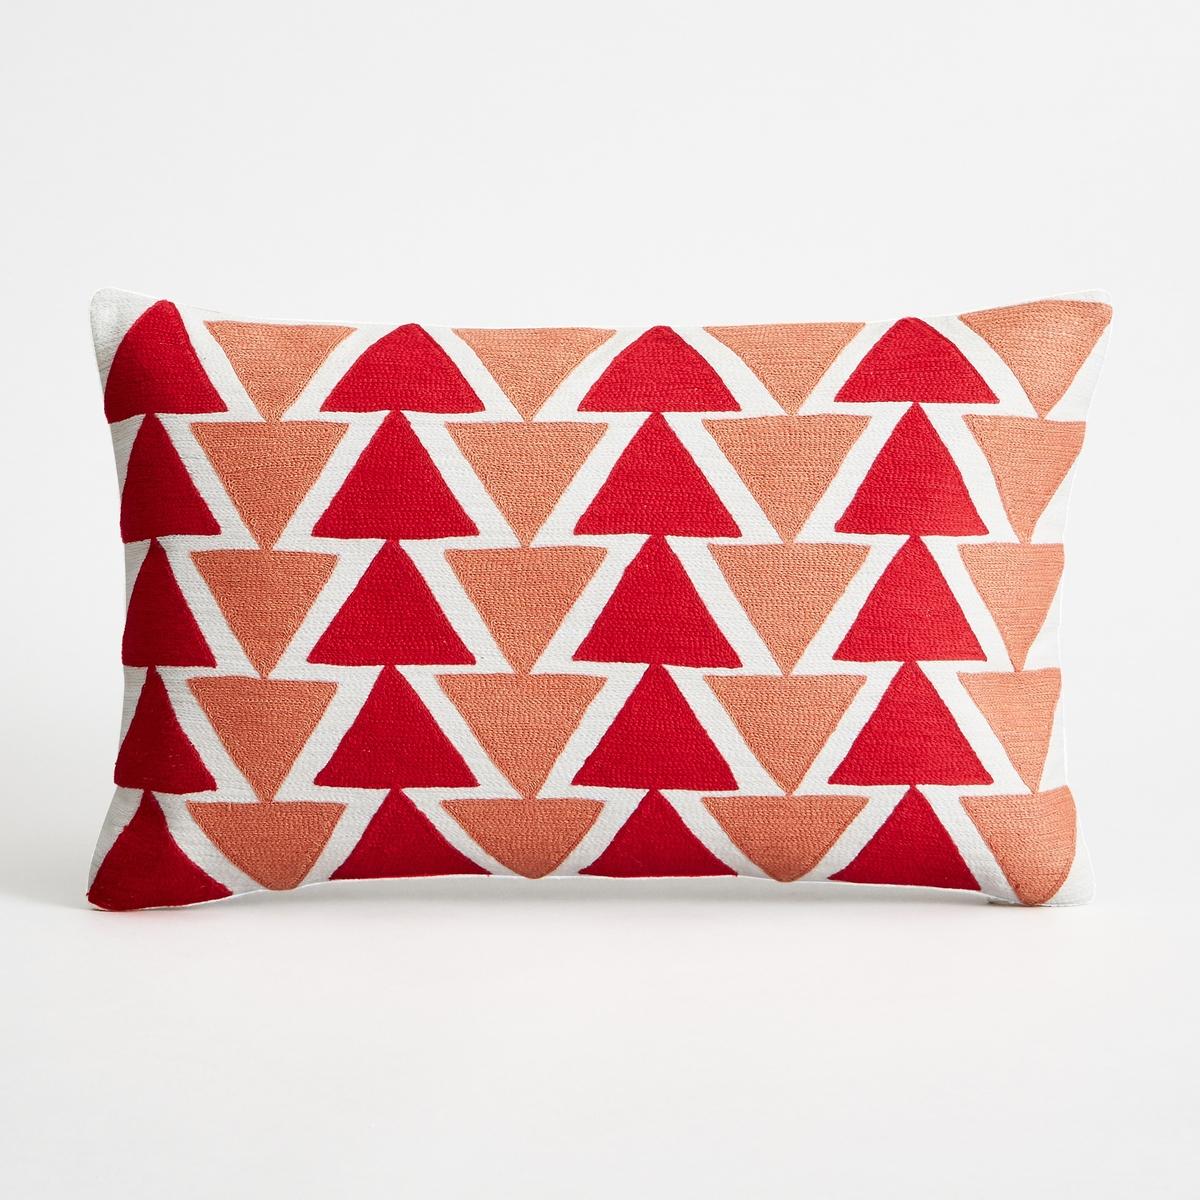 Наволочка на подушку-валик Triangolo<br><br>Цвет: красный<br>Размер: 50 x 30 см